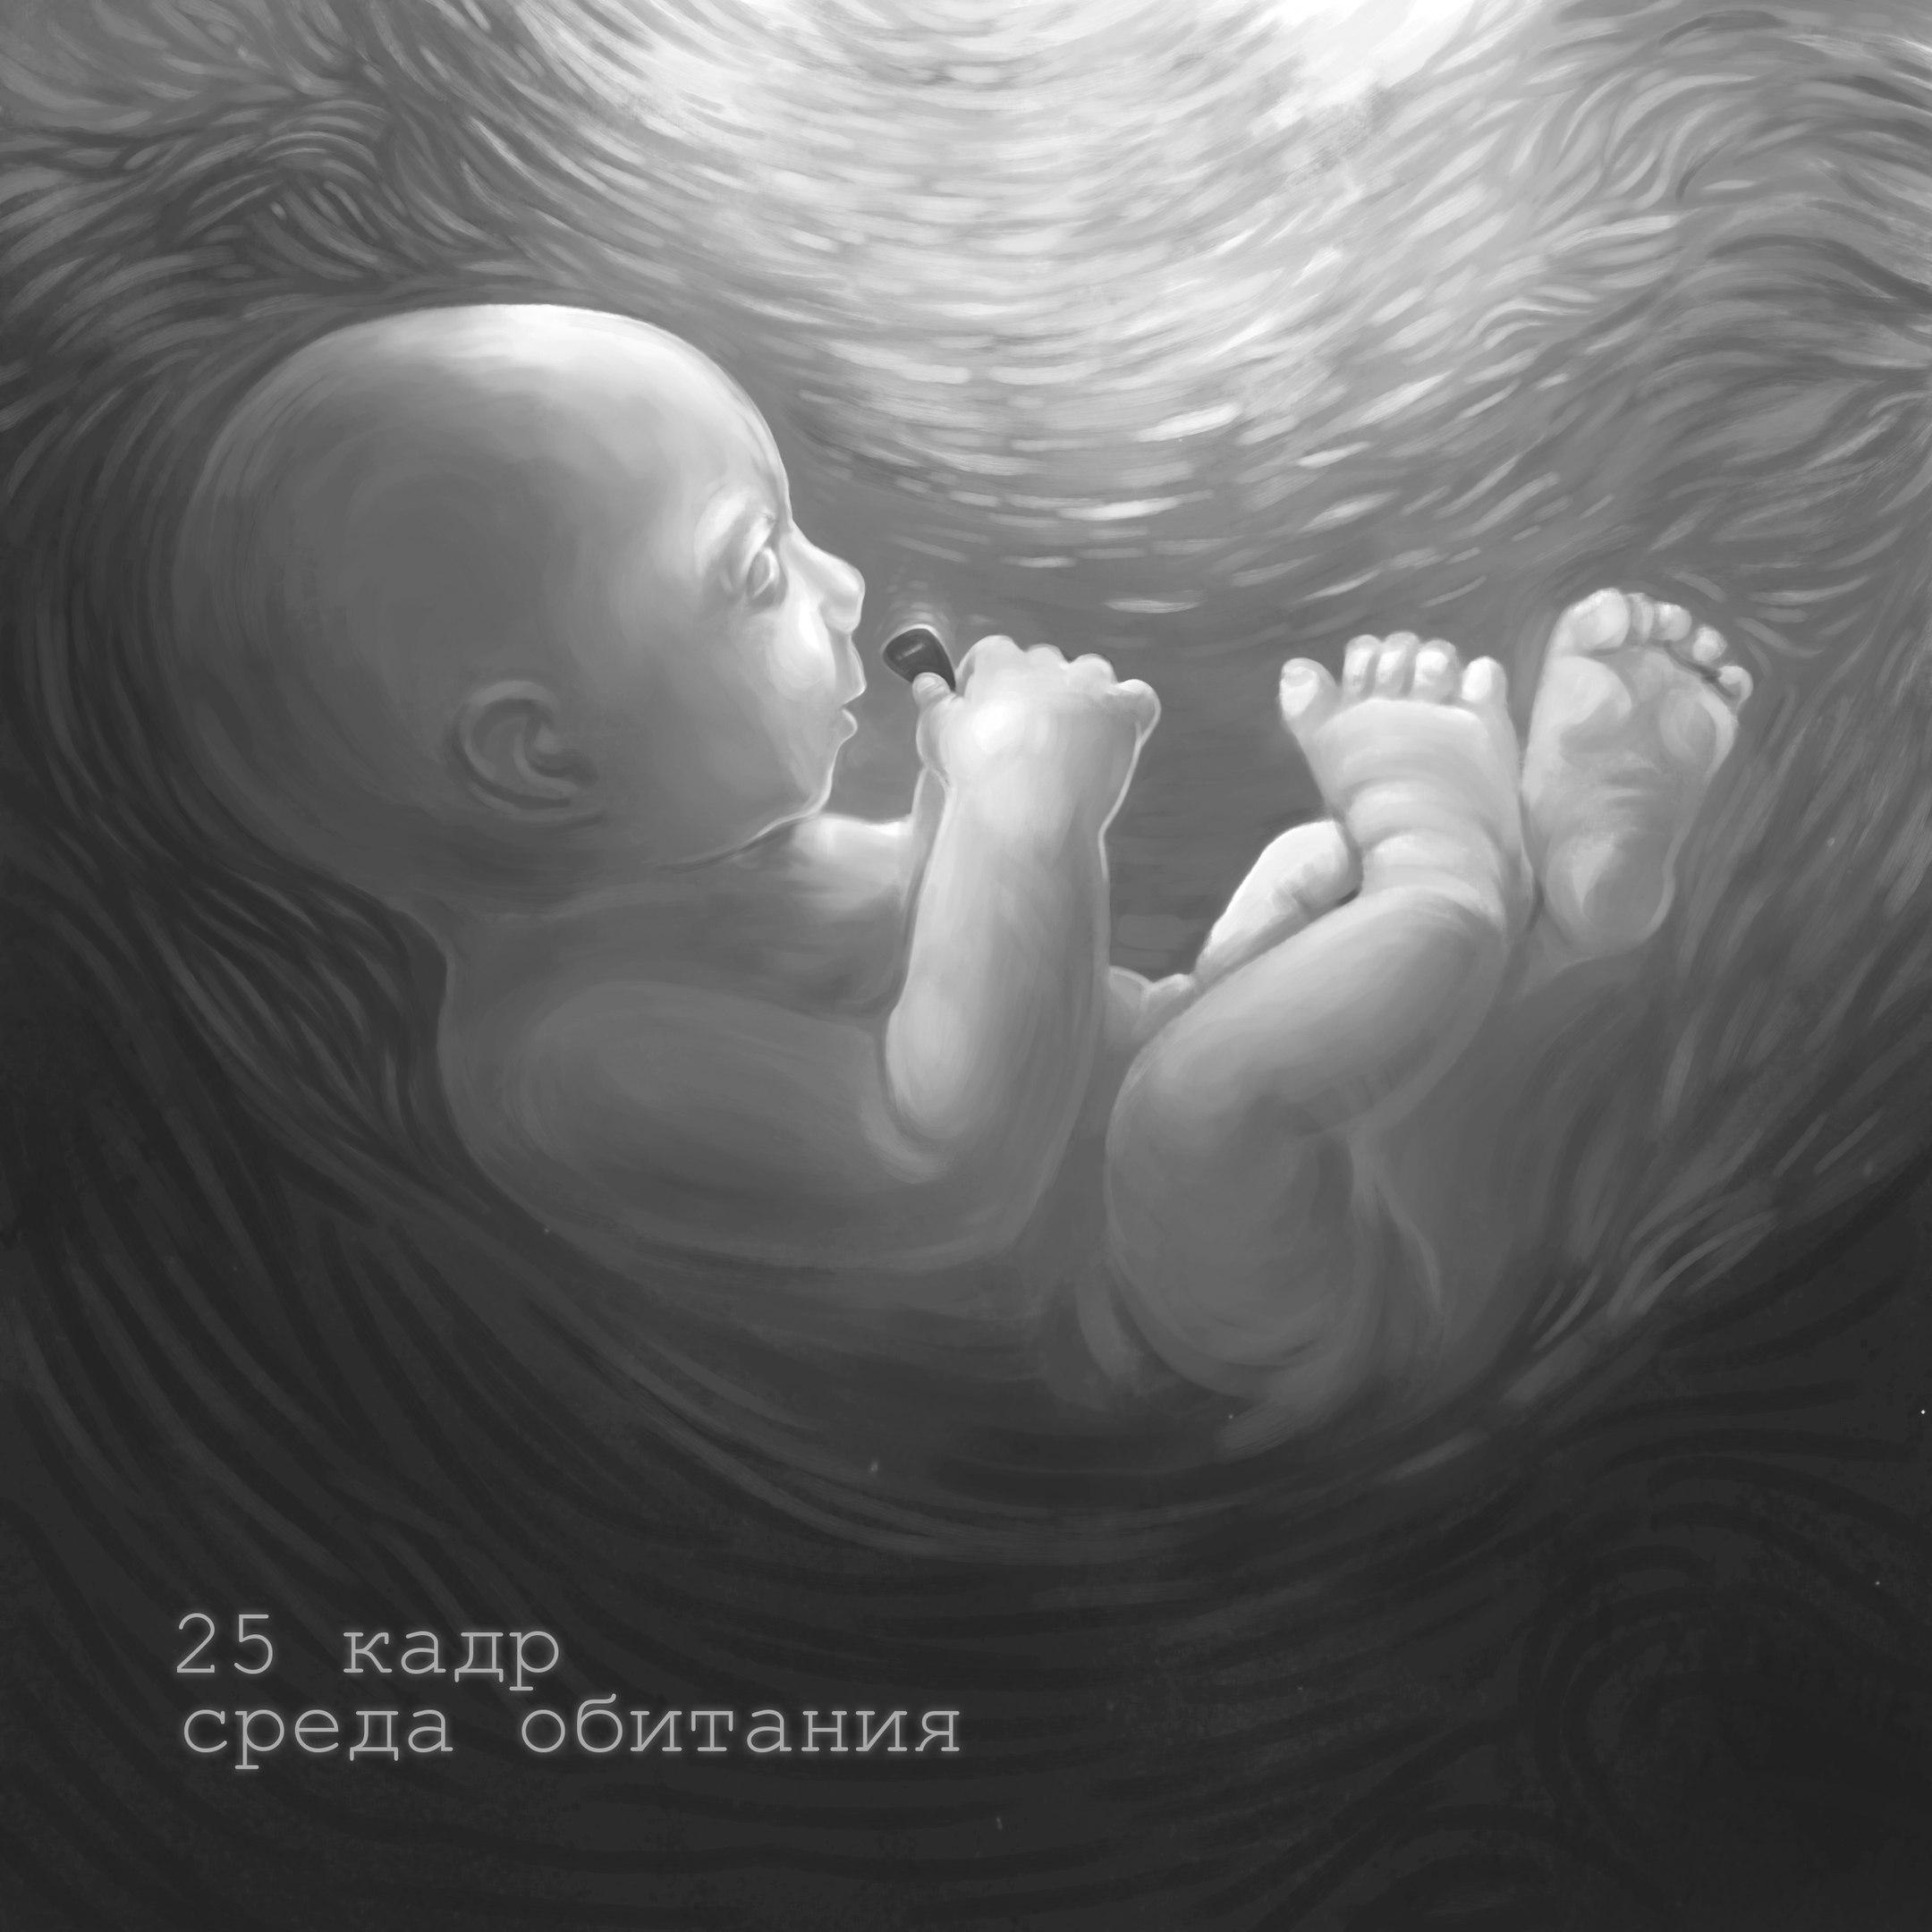 25 кадр: как он влияет на психику человека   Умная   Яндекс Дзен   2160x2160